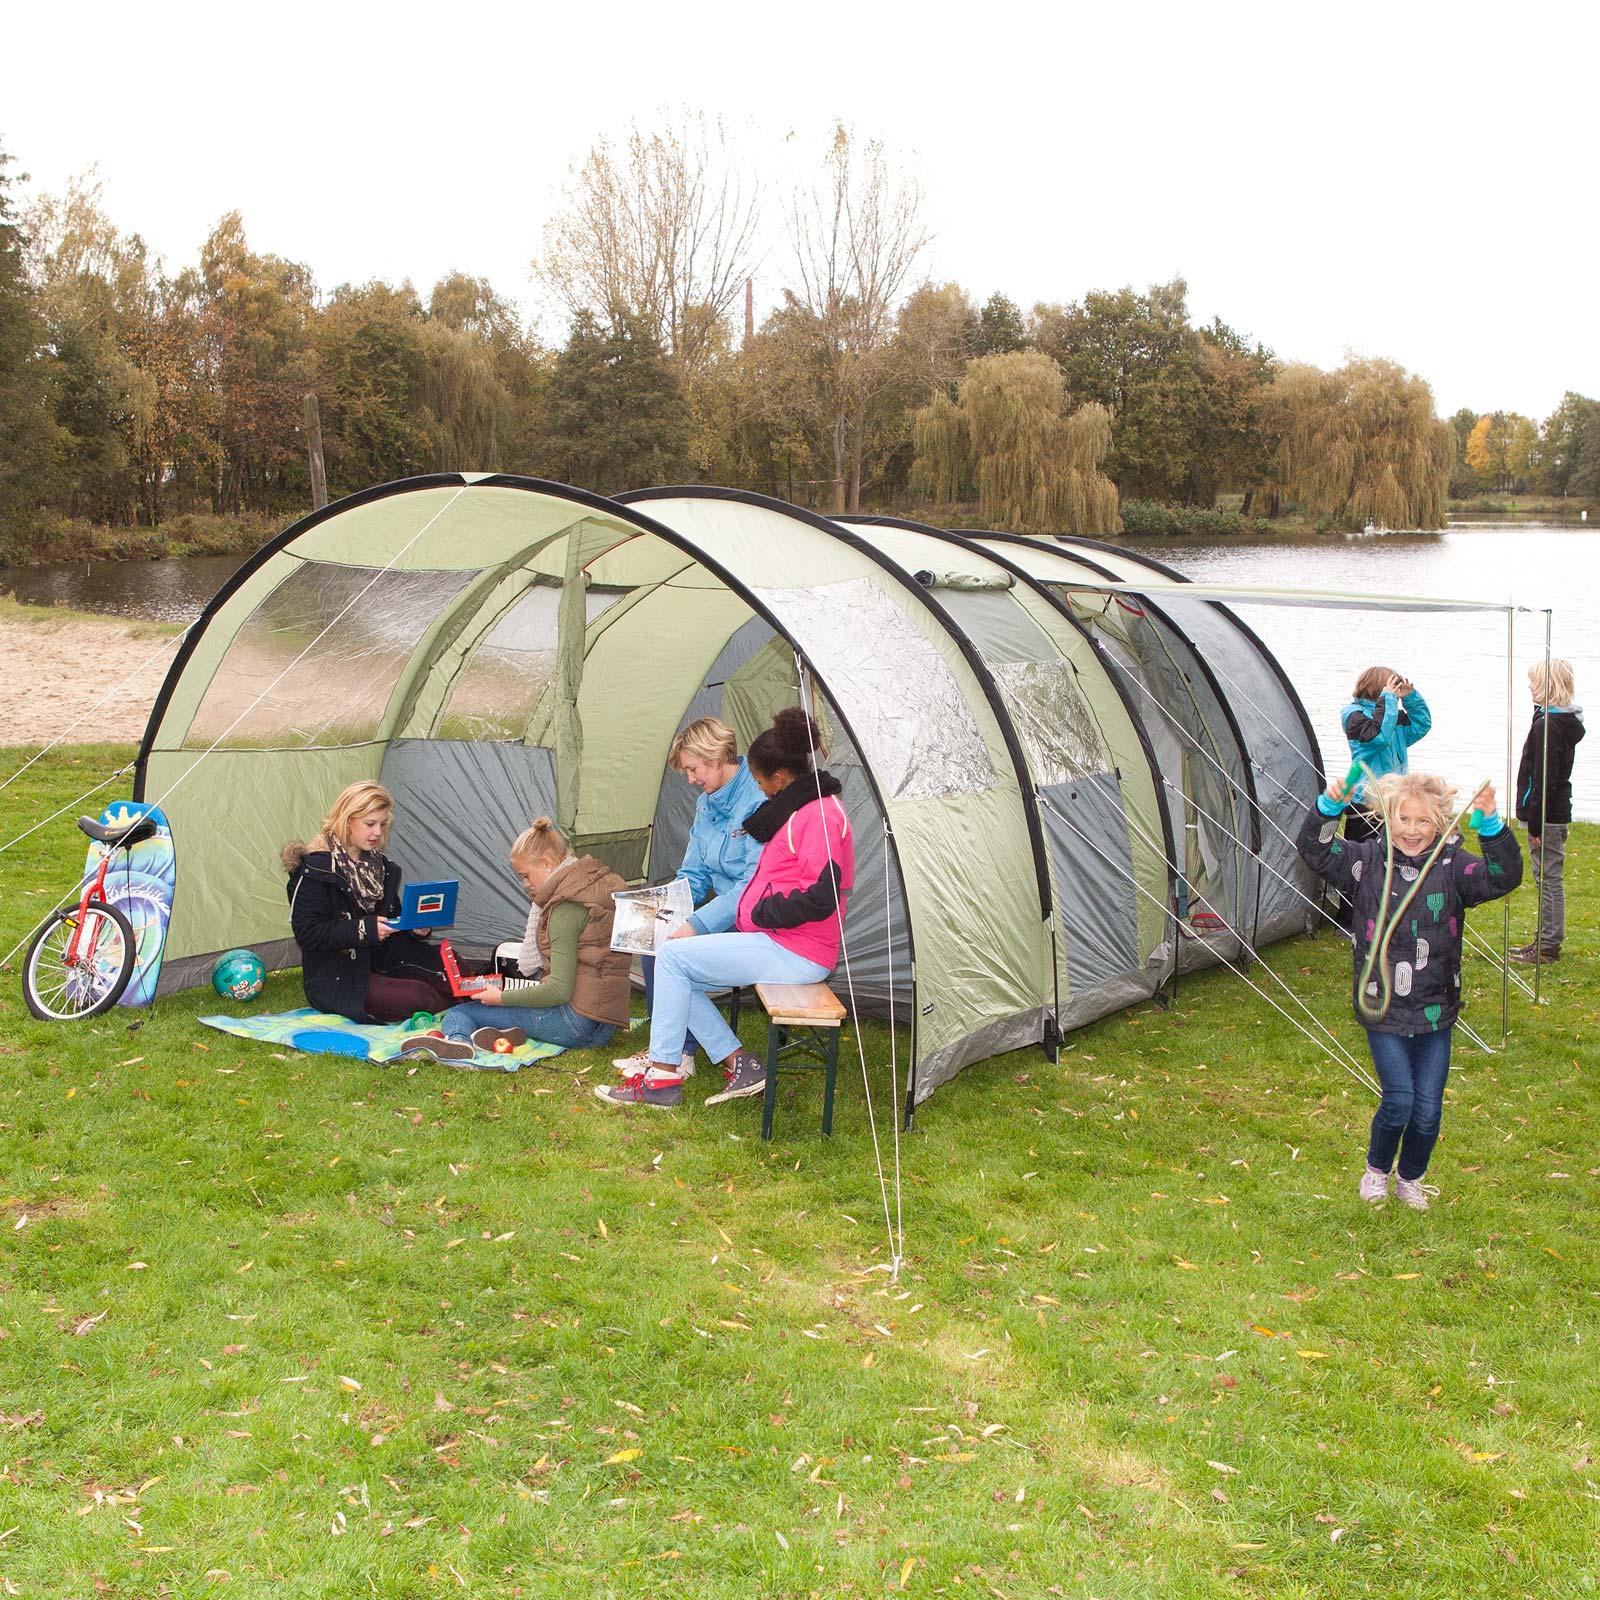 5 Quadratmeter Zelt : High peak sapri pers camping familienzelt vorbau neu